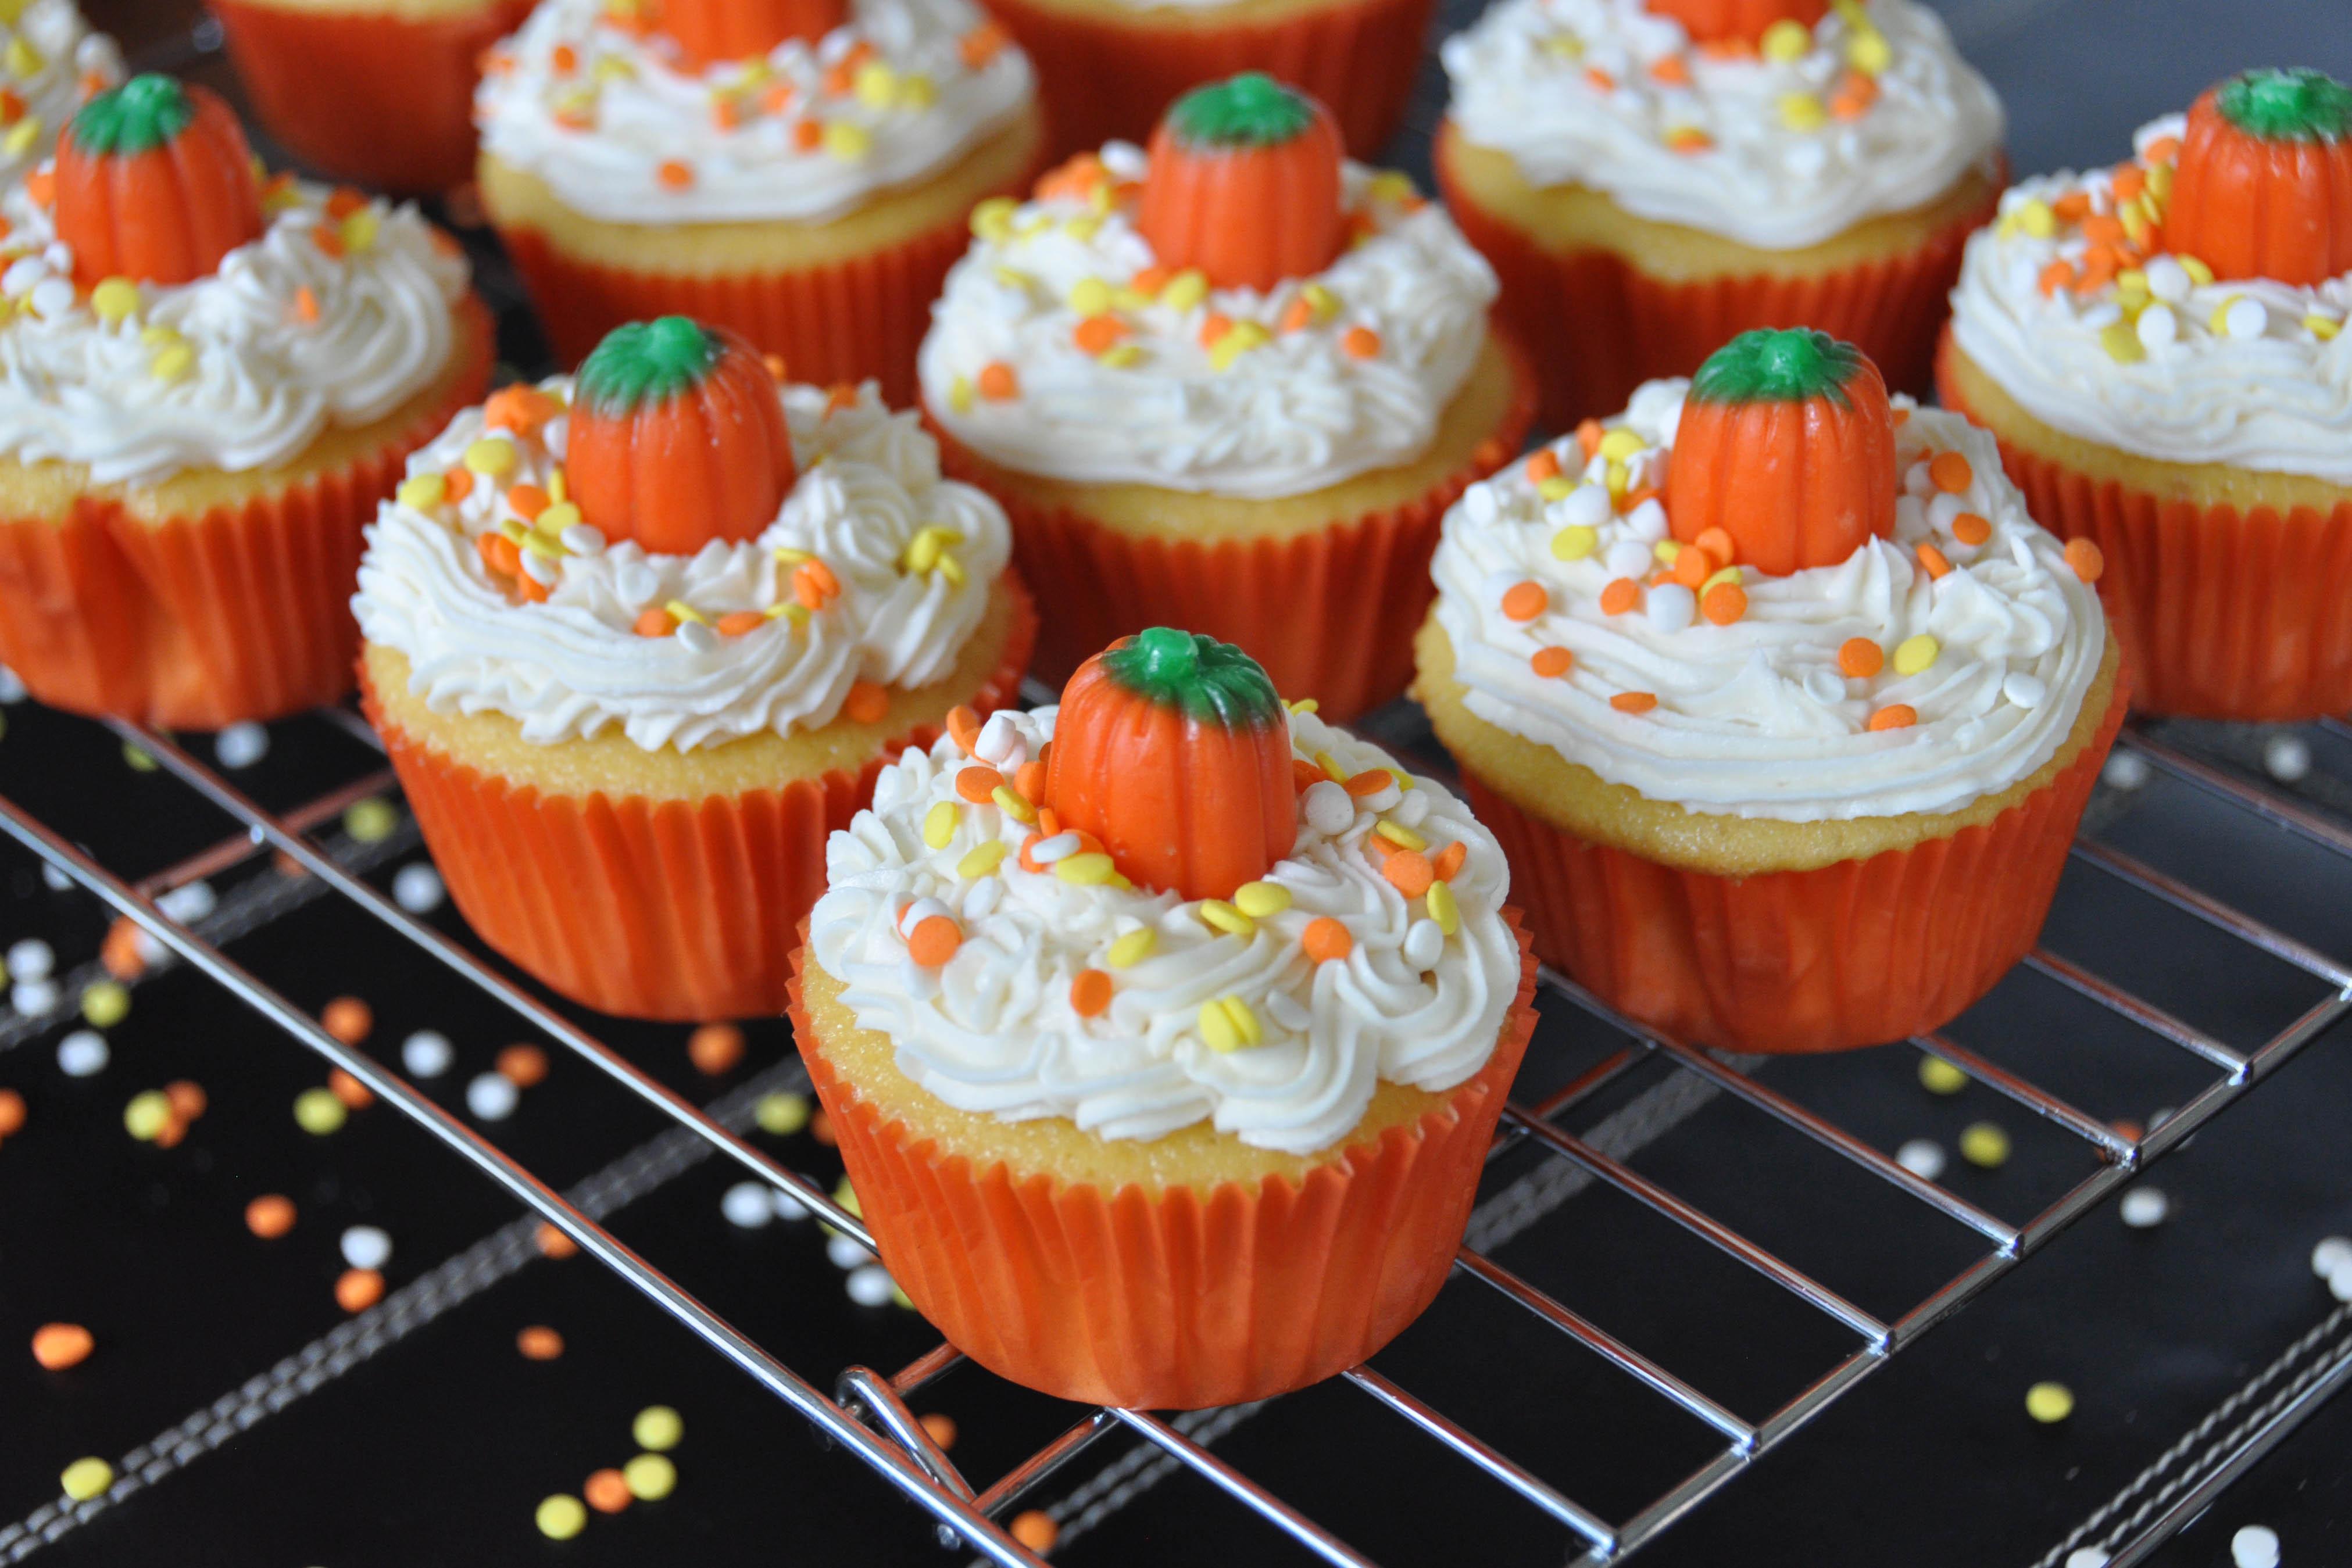 Cupcakes For Halloween  Pumpkin Cupcakes